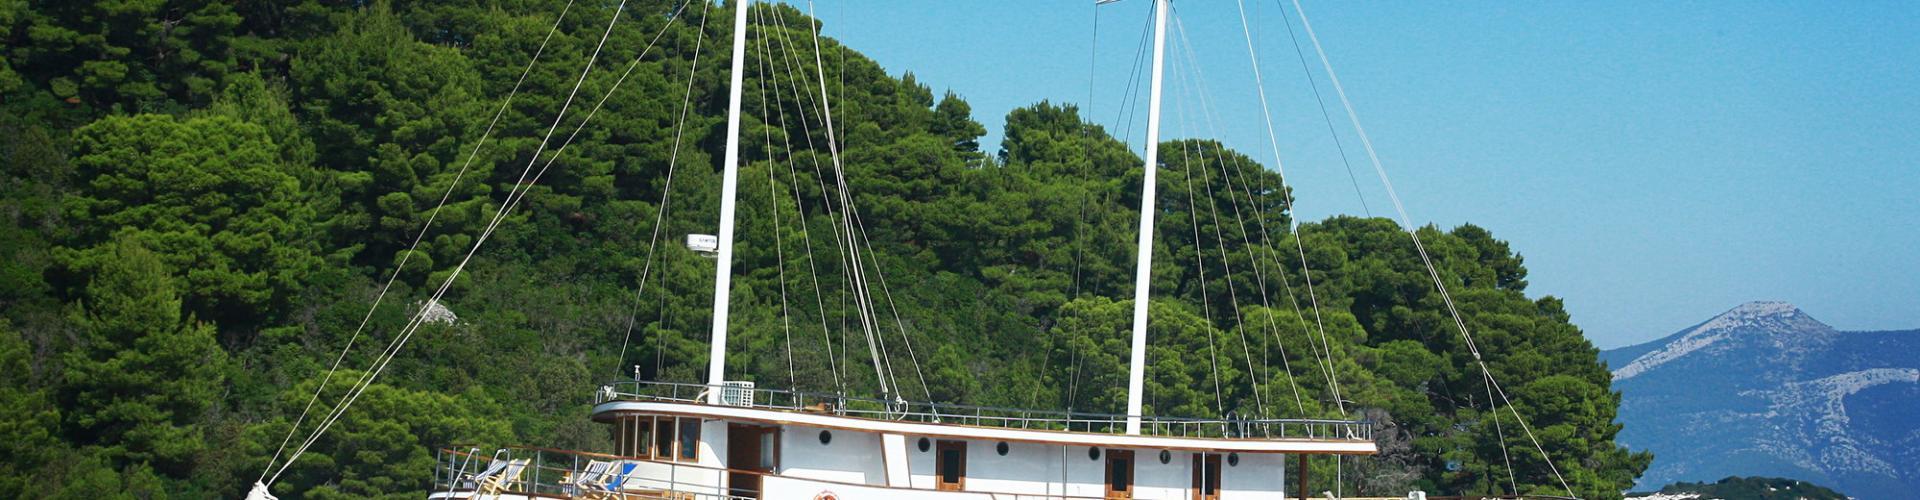 Premium cruiser MV Meridijan- motor sailer